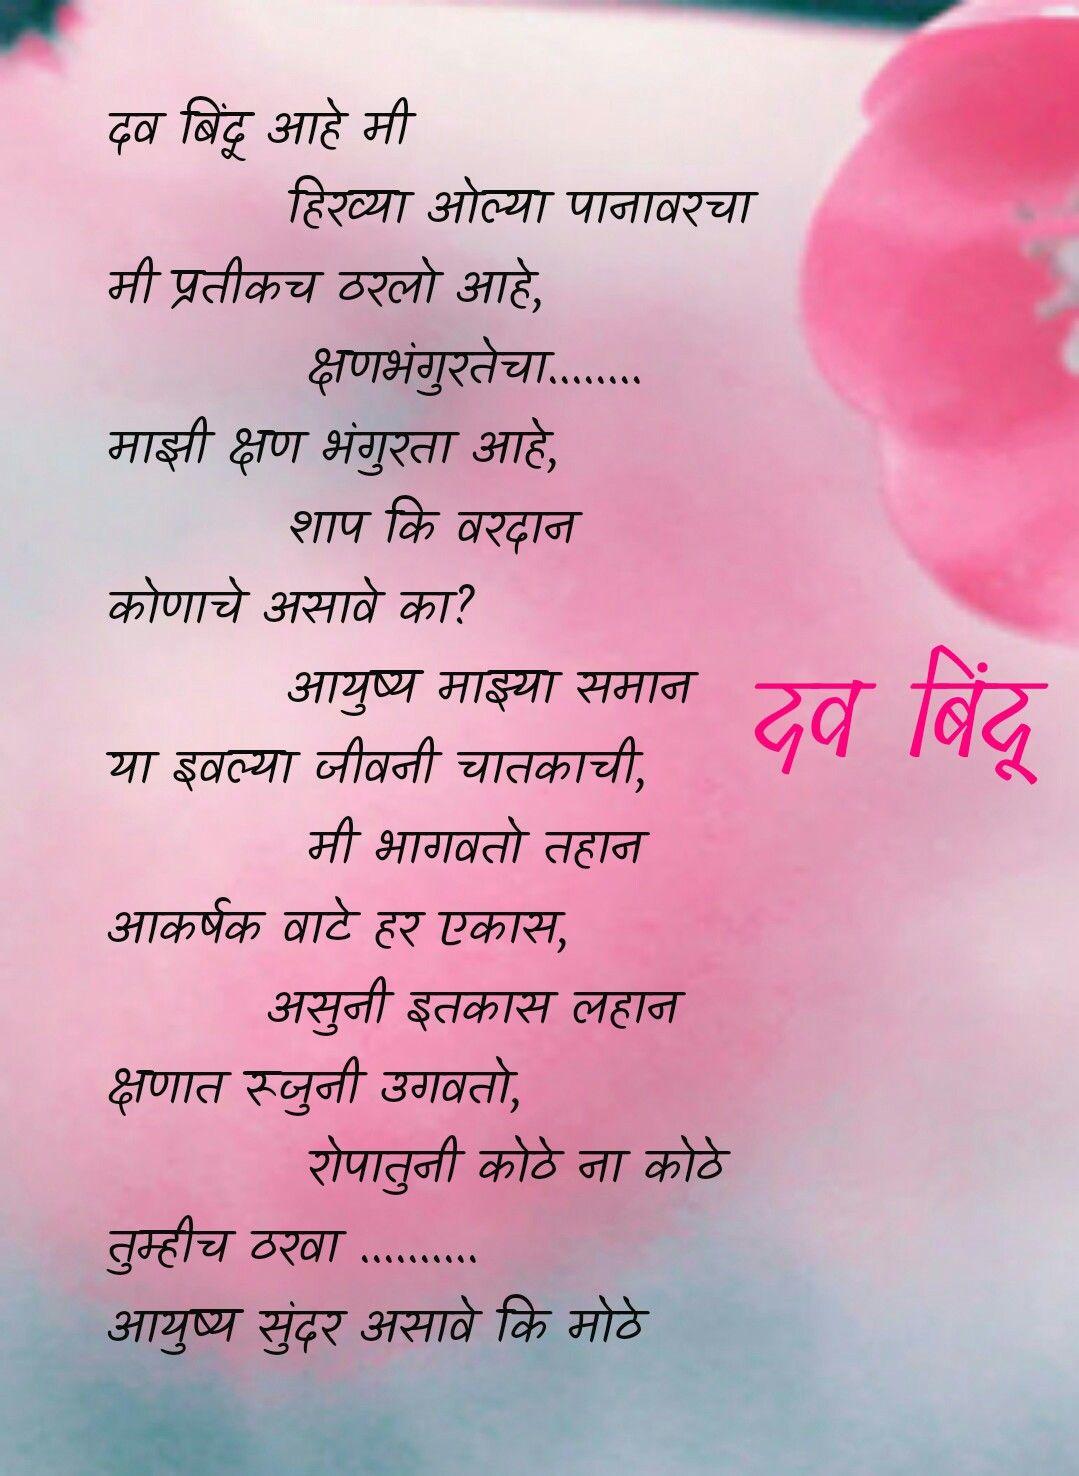 दव बिंदू,,,, Kids poems, Marathi poems, Poems